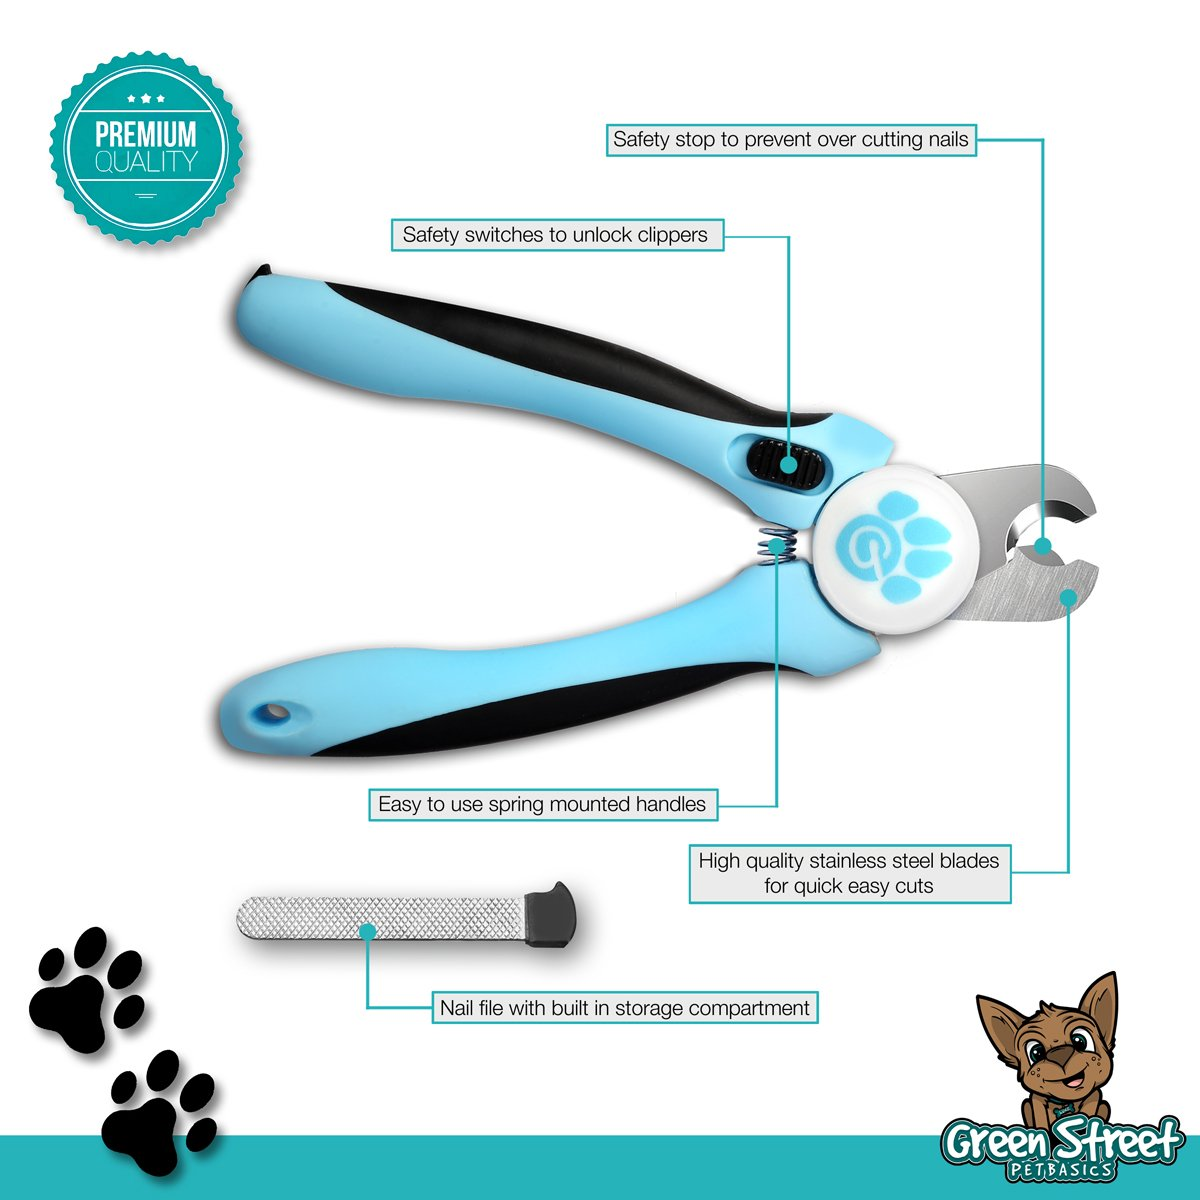 Amazon.com: Green Street Pet Basics Dog Nail Clippers with Nail File